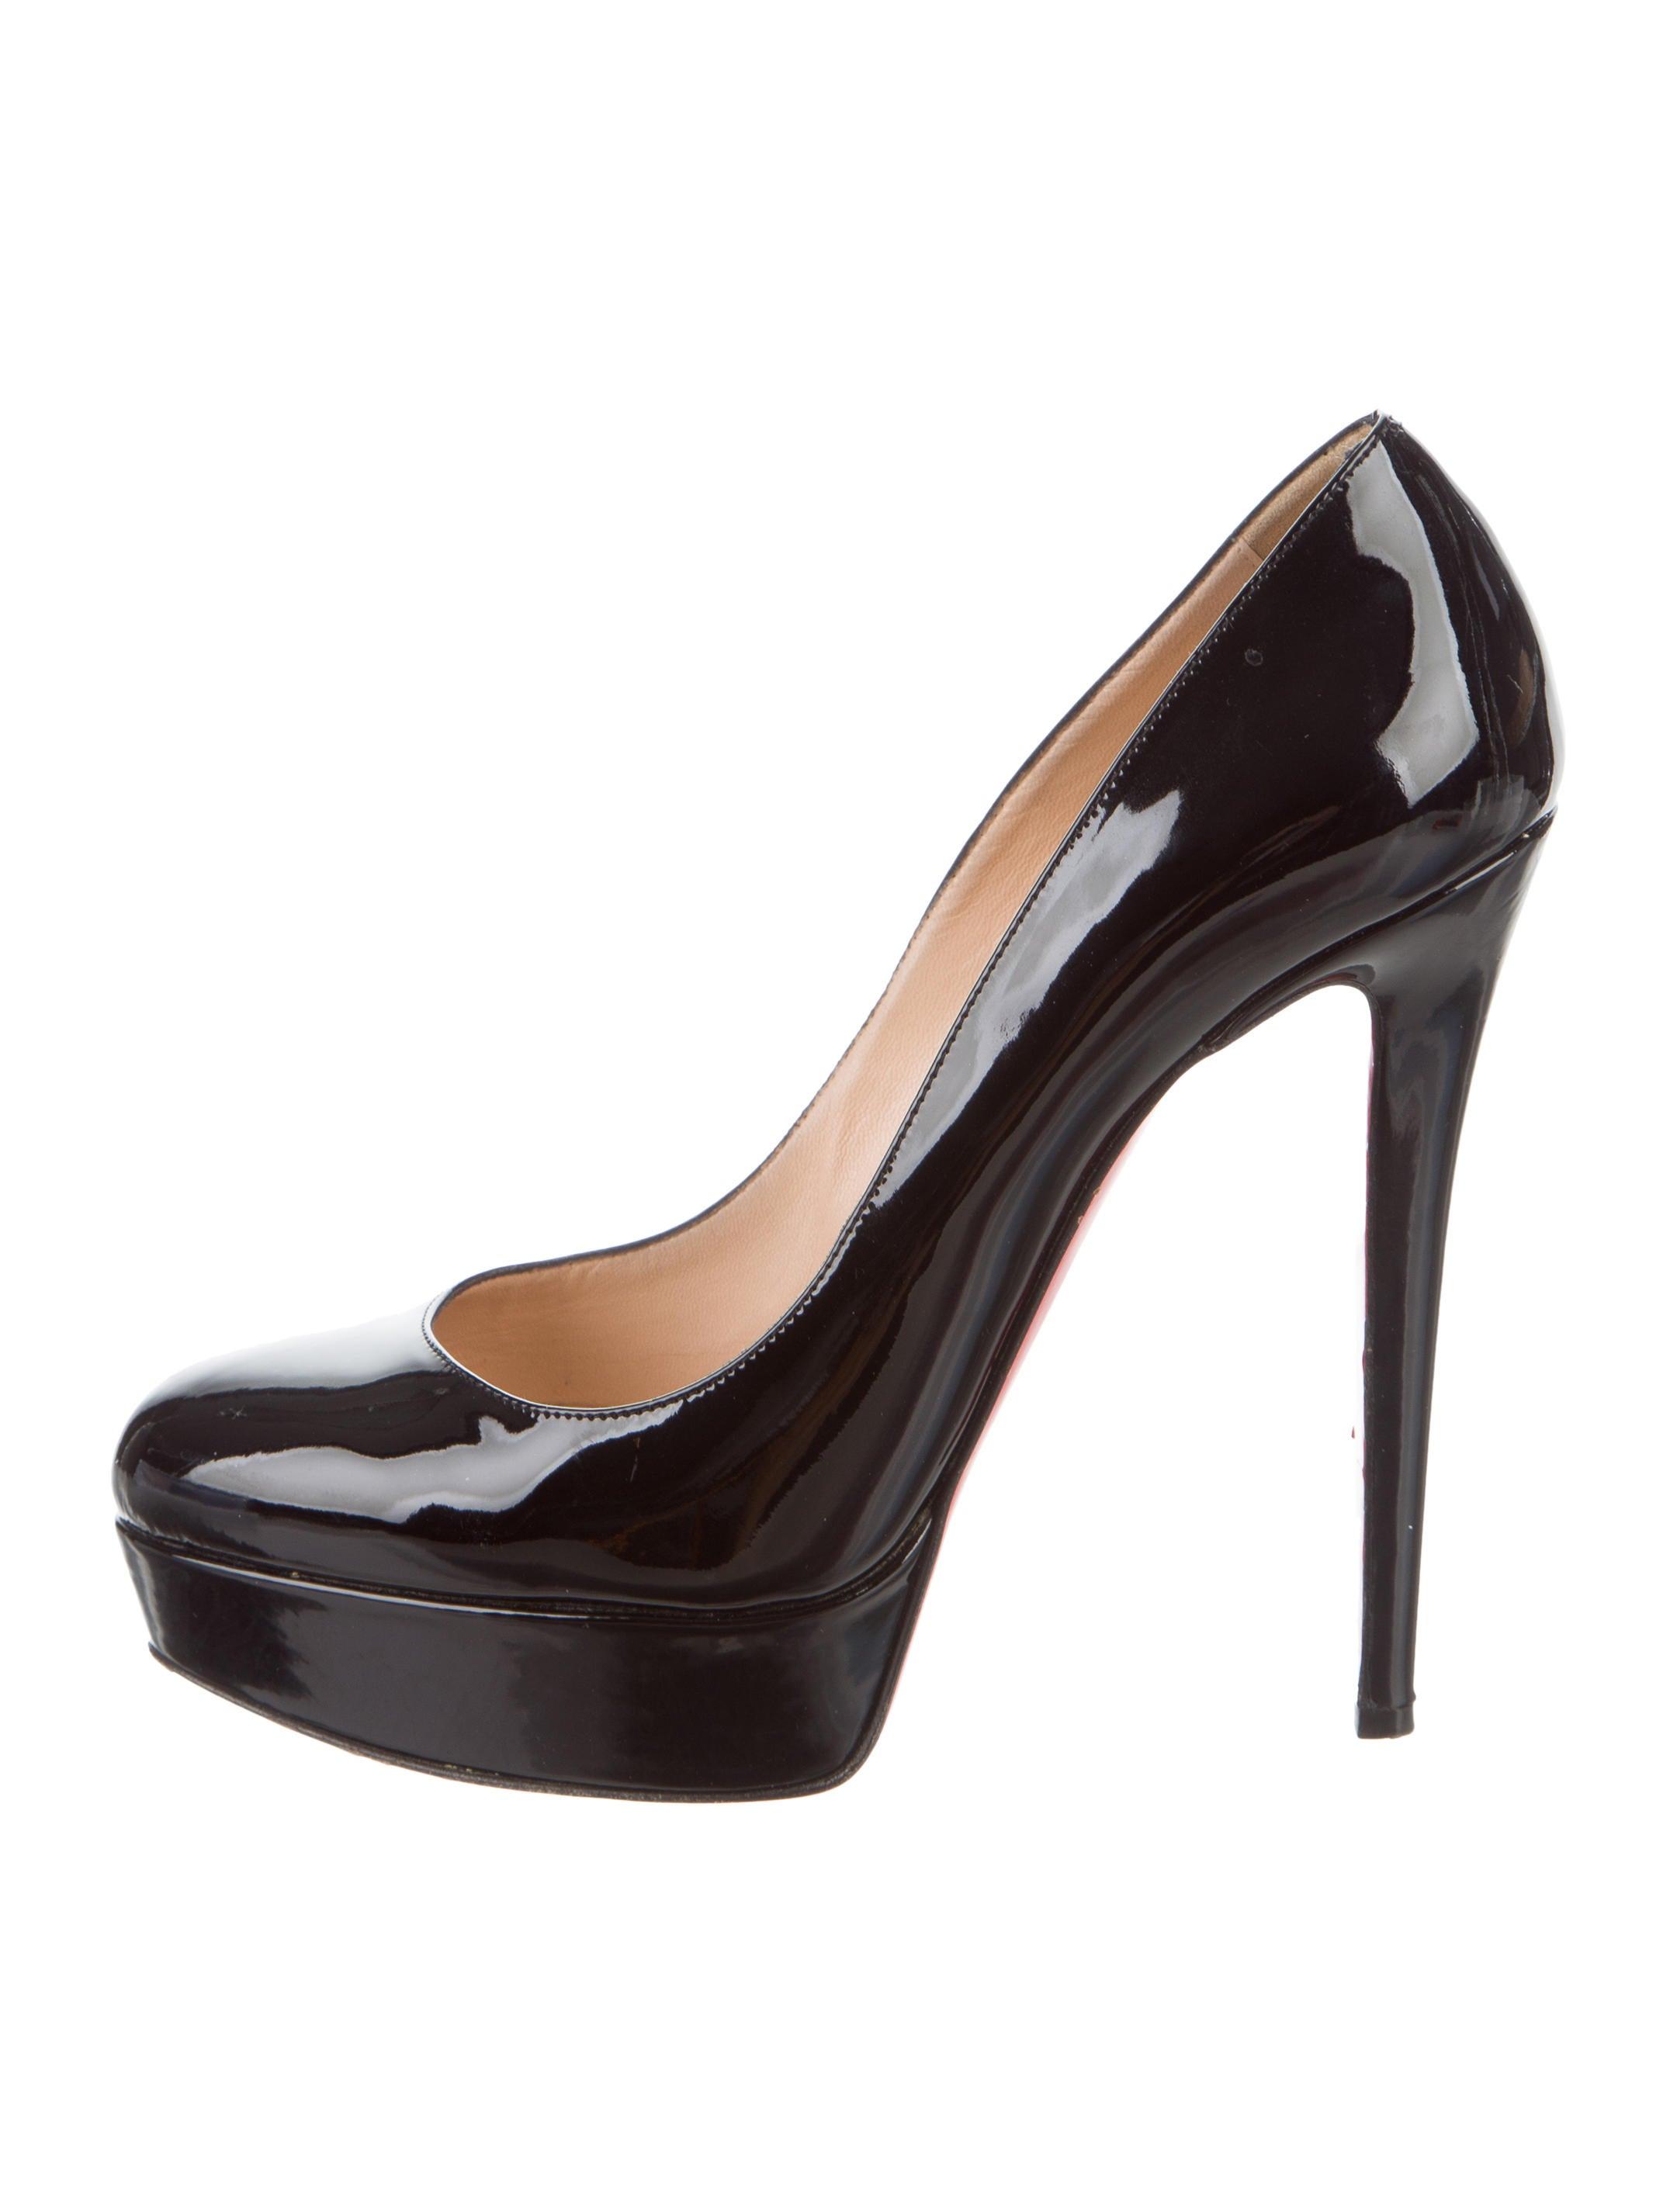 b758feb87c0 Christian Louboutin City 120 Platform Sandals Shoe Zone | Tenders Portal